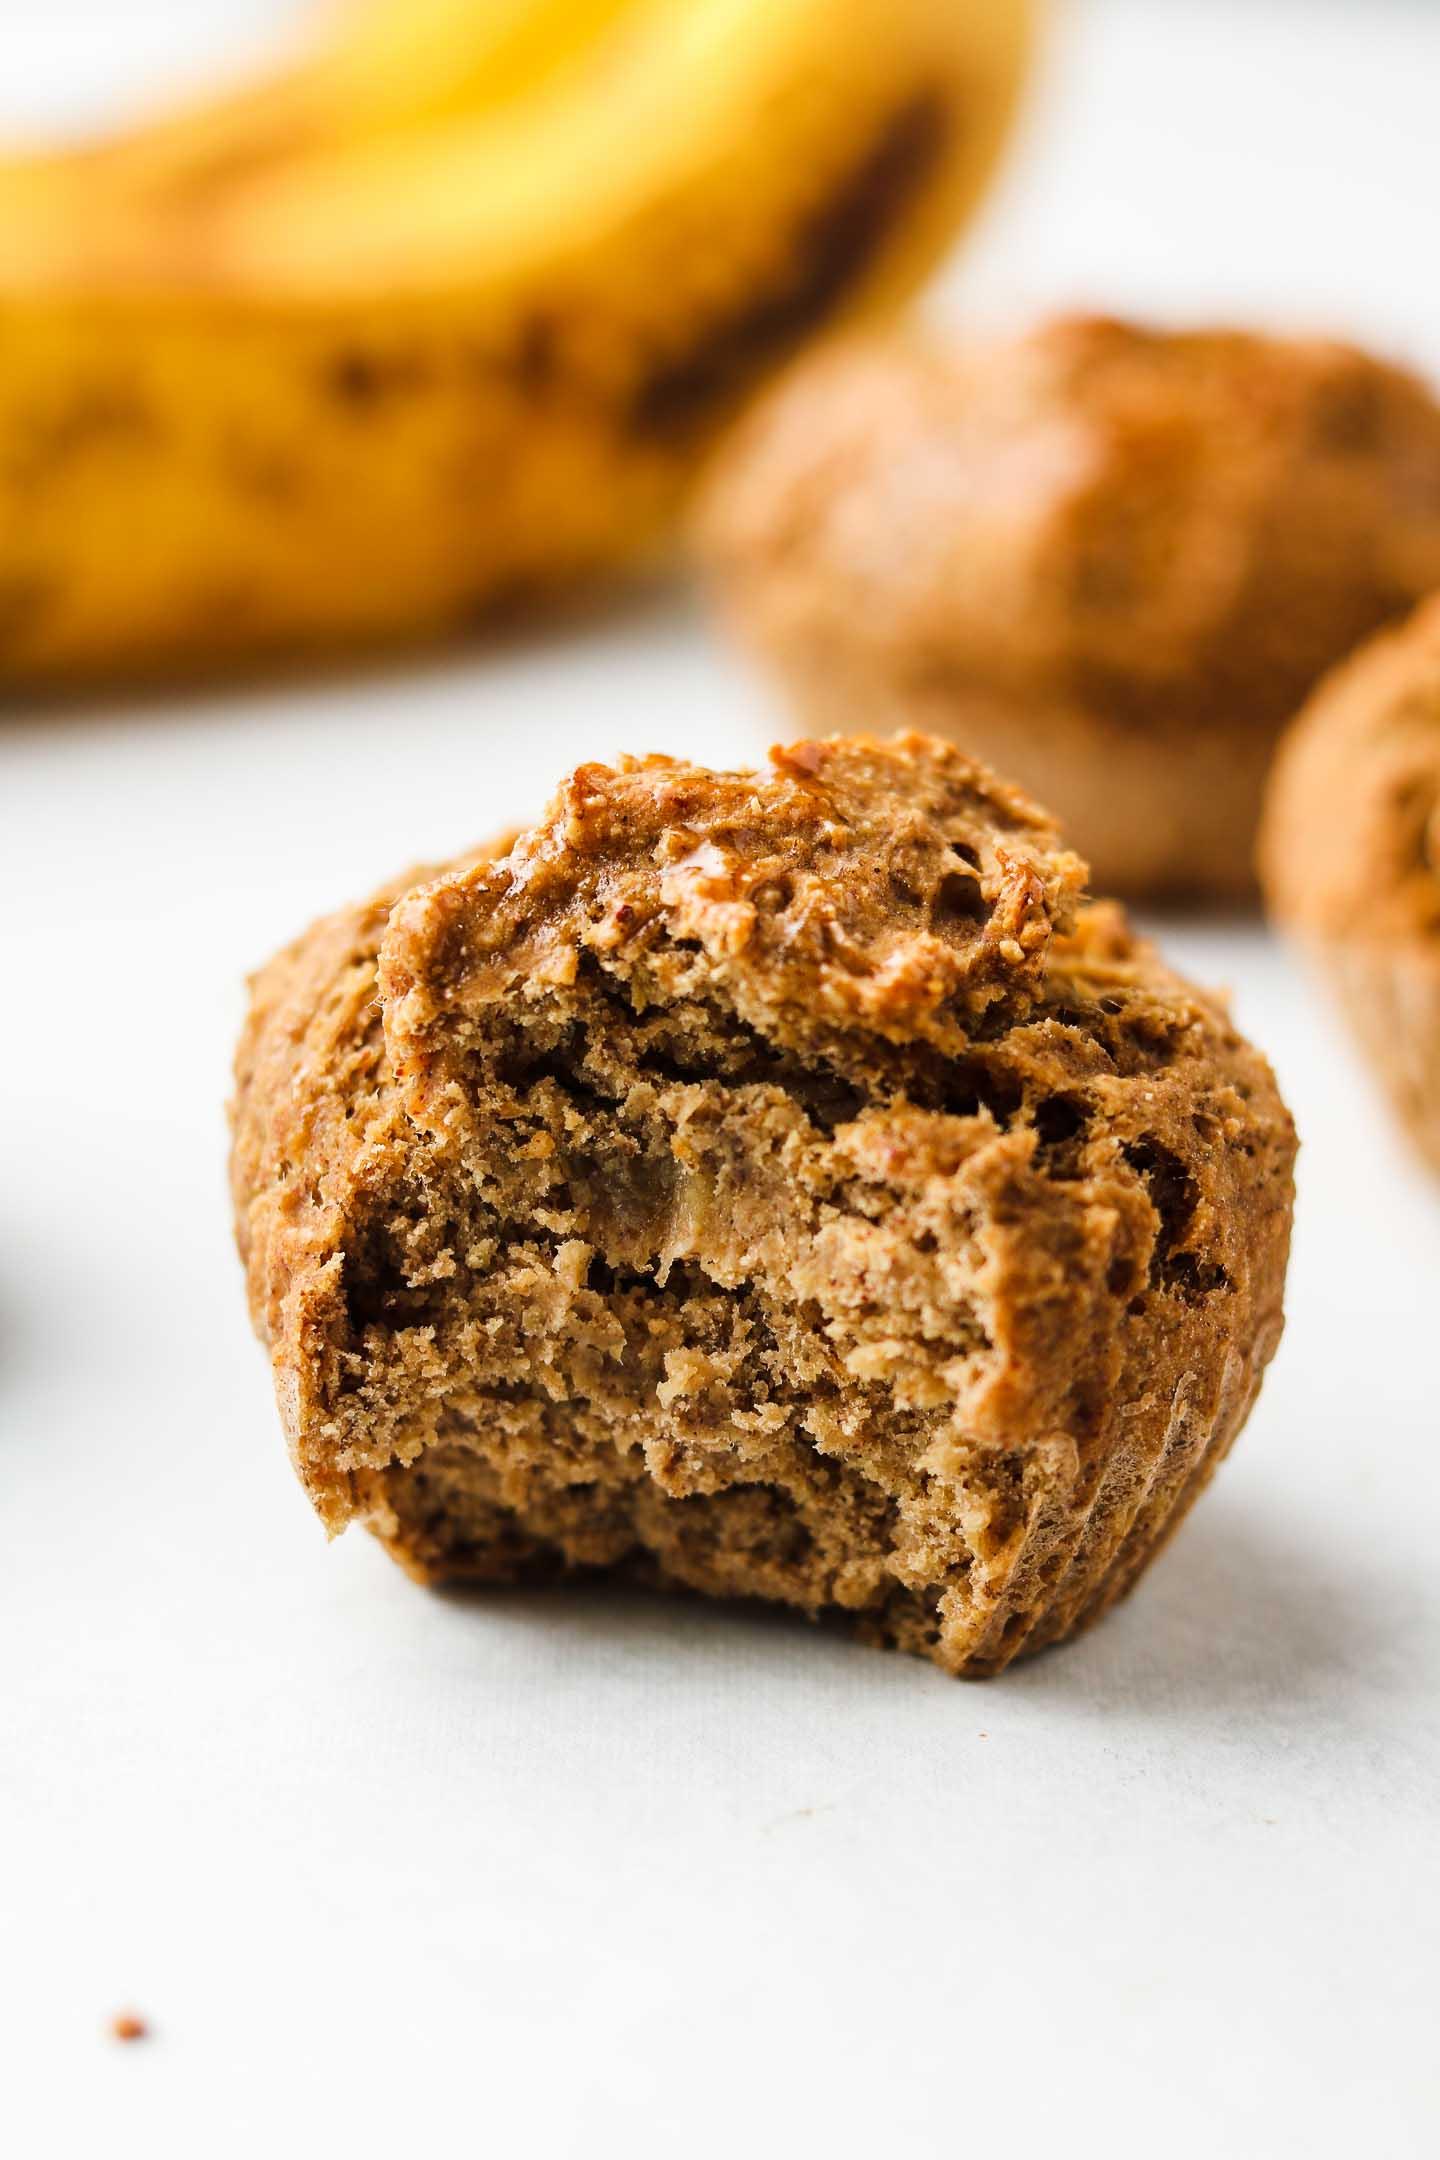 Vegan Banana Protein Muffins Gluten Free Oil Free Okonomi Kitchen